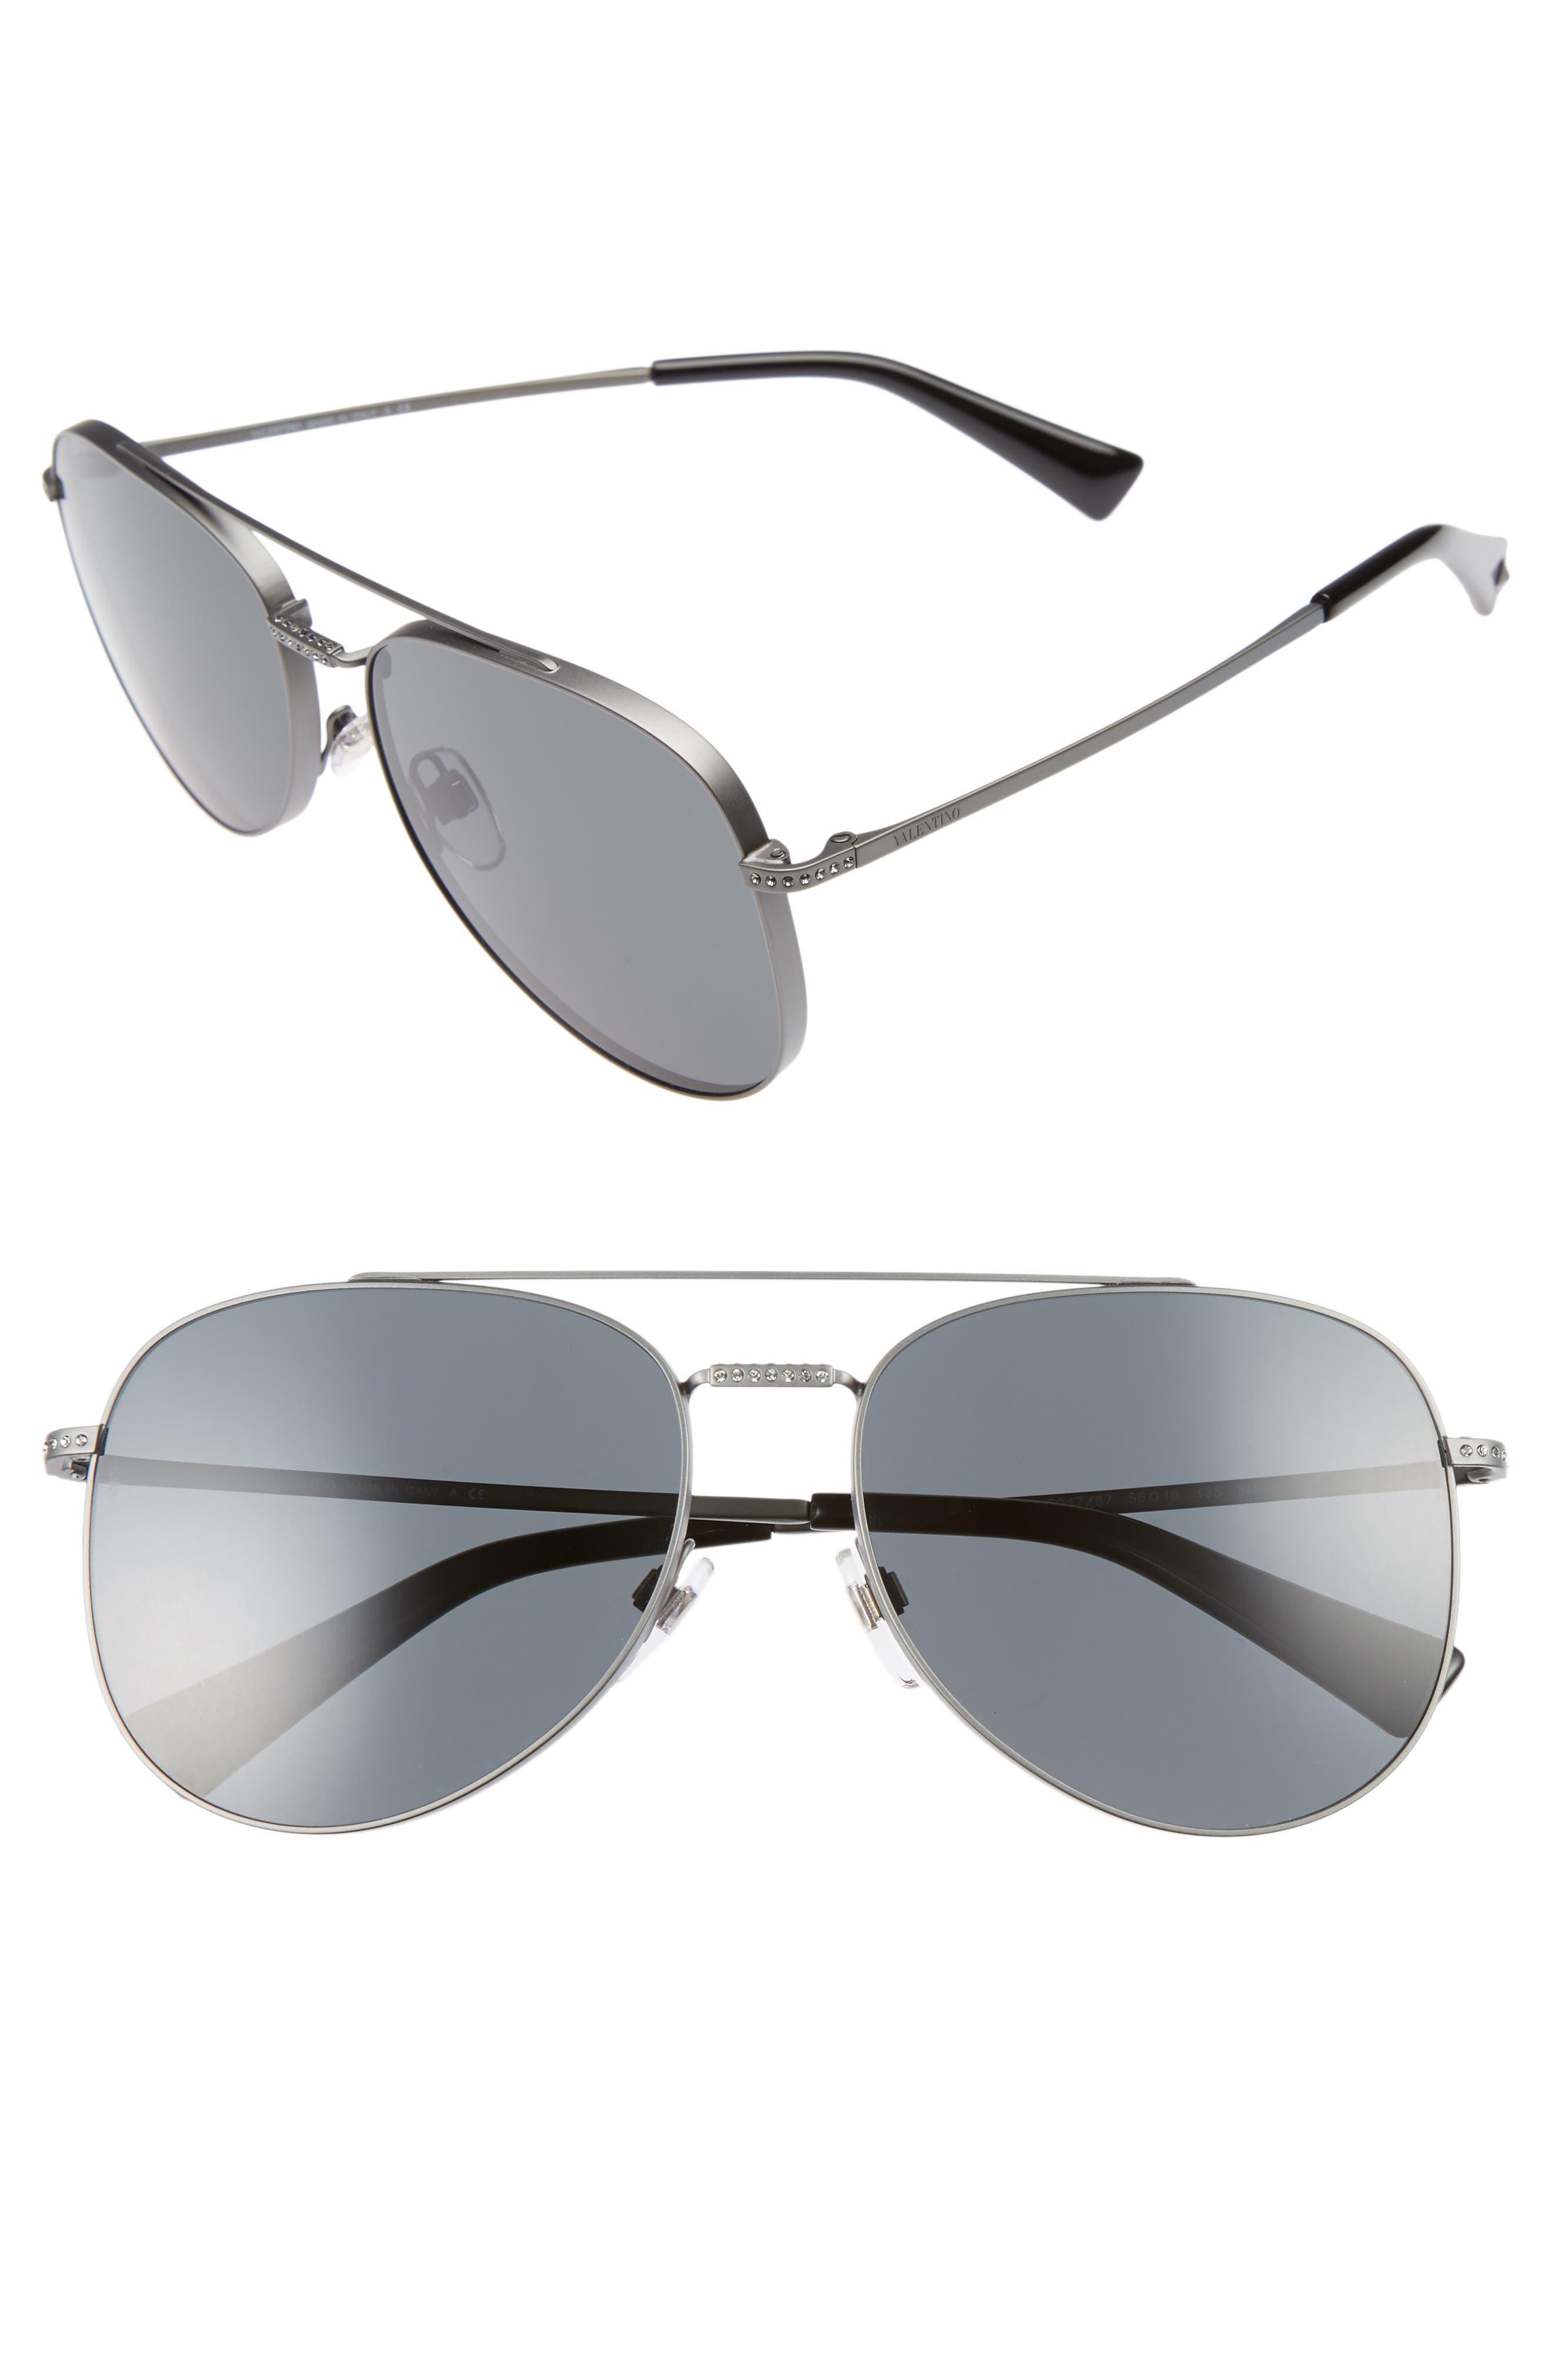 56mm Aviator Sunglasses,                         Main,                         color, MATTE RUTHENIUM/ GREY CRYSTAL